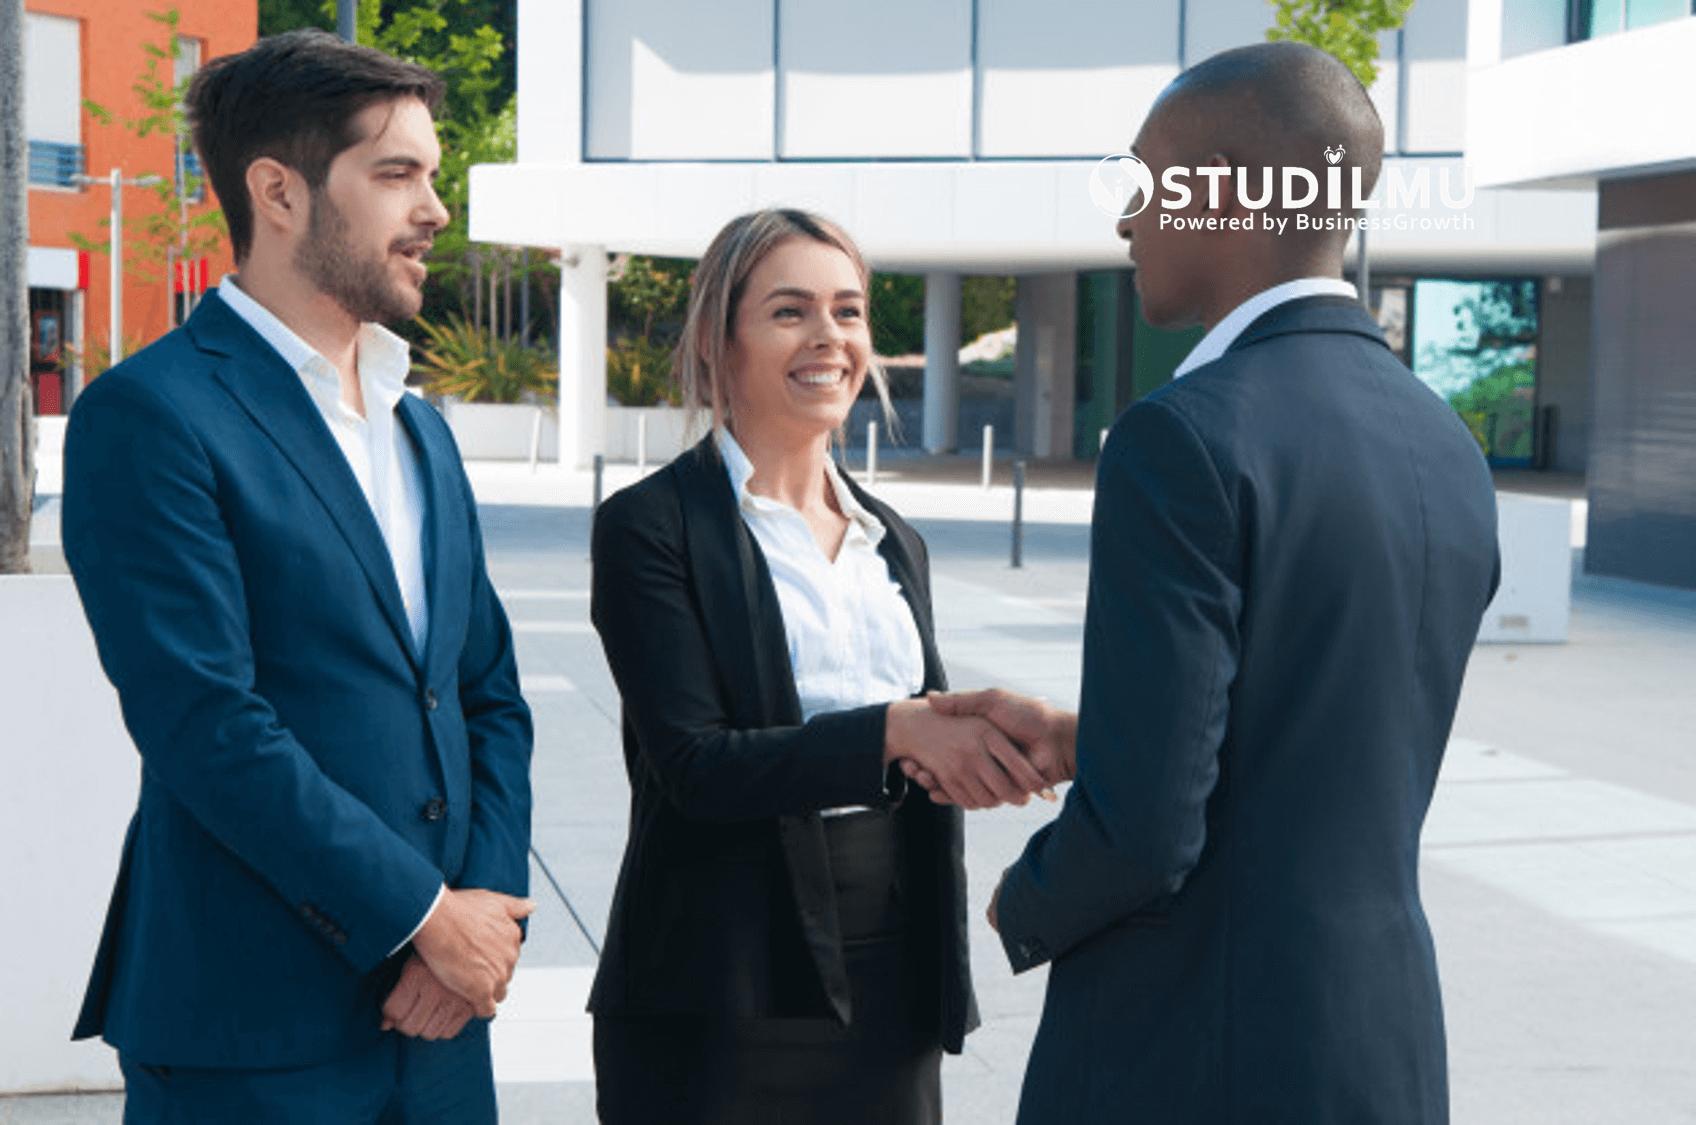 STUDILMU Career Advice - 7 Cara Menjadi Lebih Percaya Diri Ketika Bertemu Klien